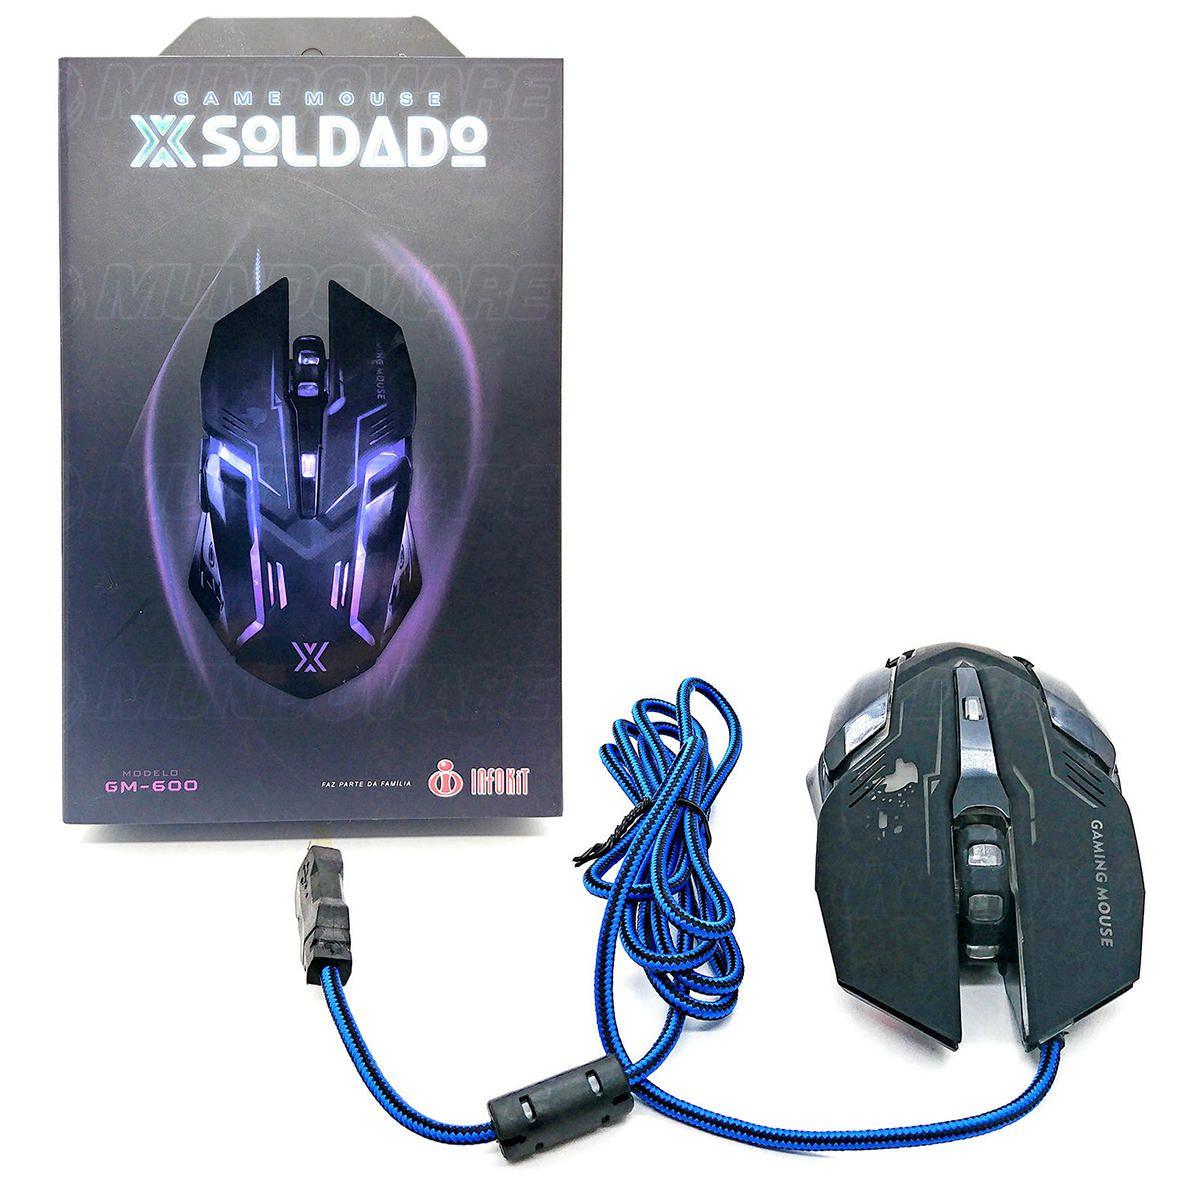 Mouse Gamer USB 3200dpi Iluminação LED RGB 6D X Soldado Infokit GM-600 Preto